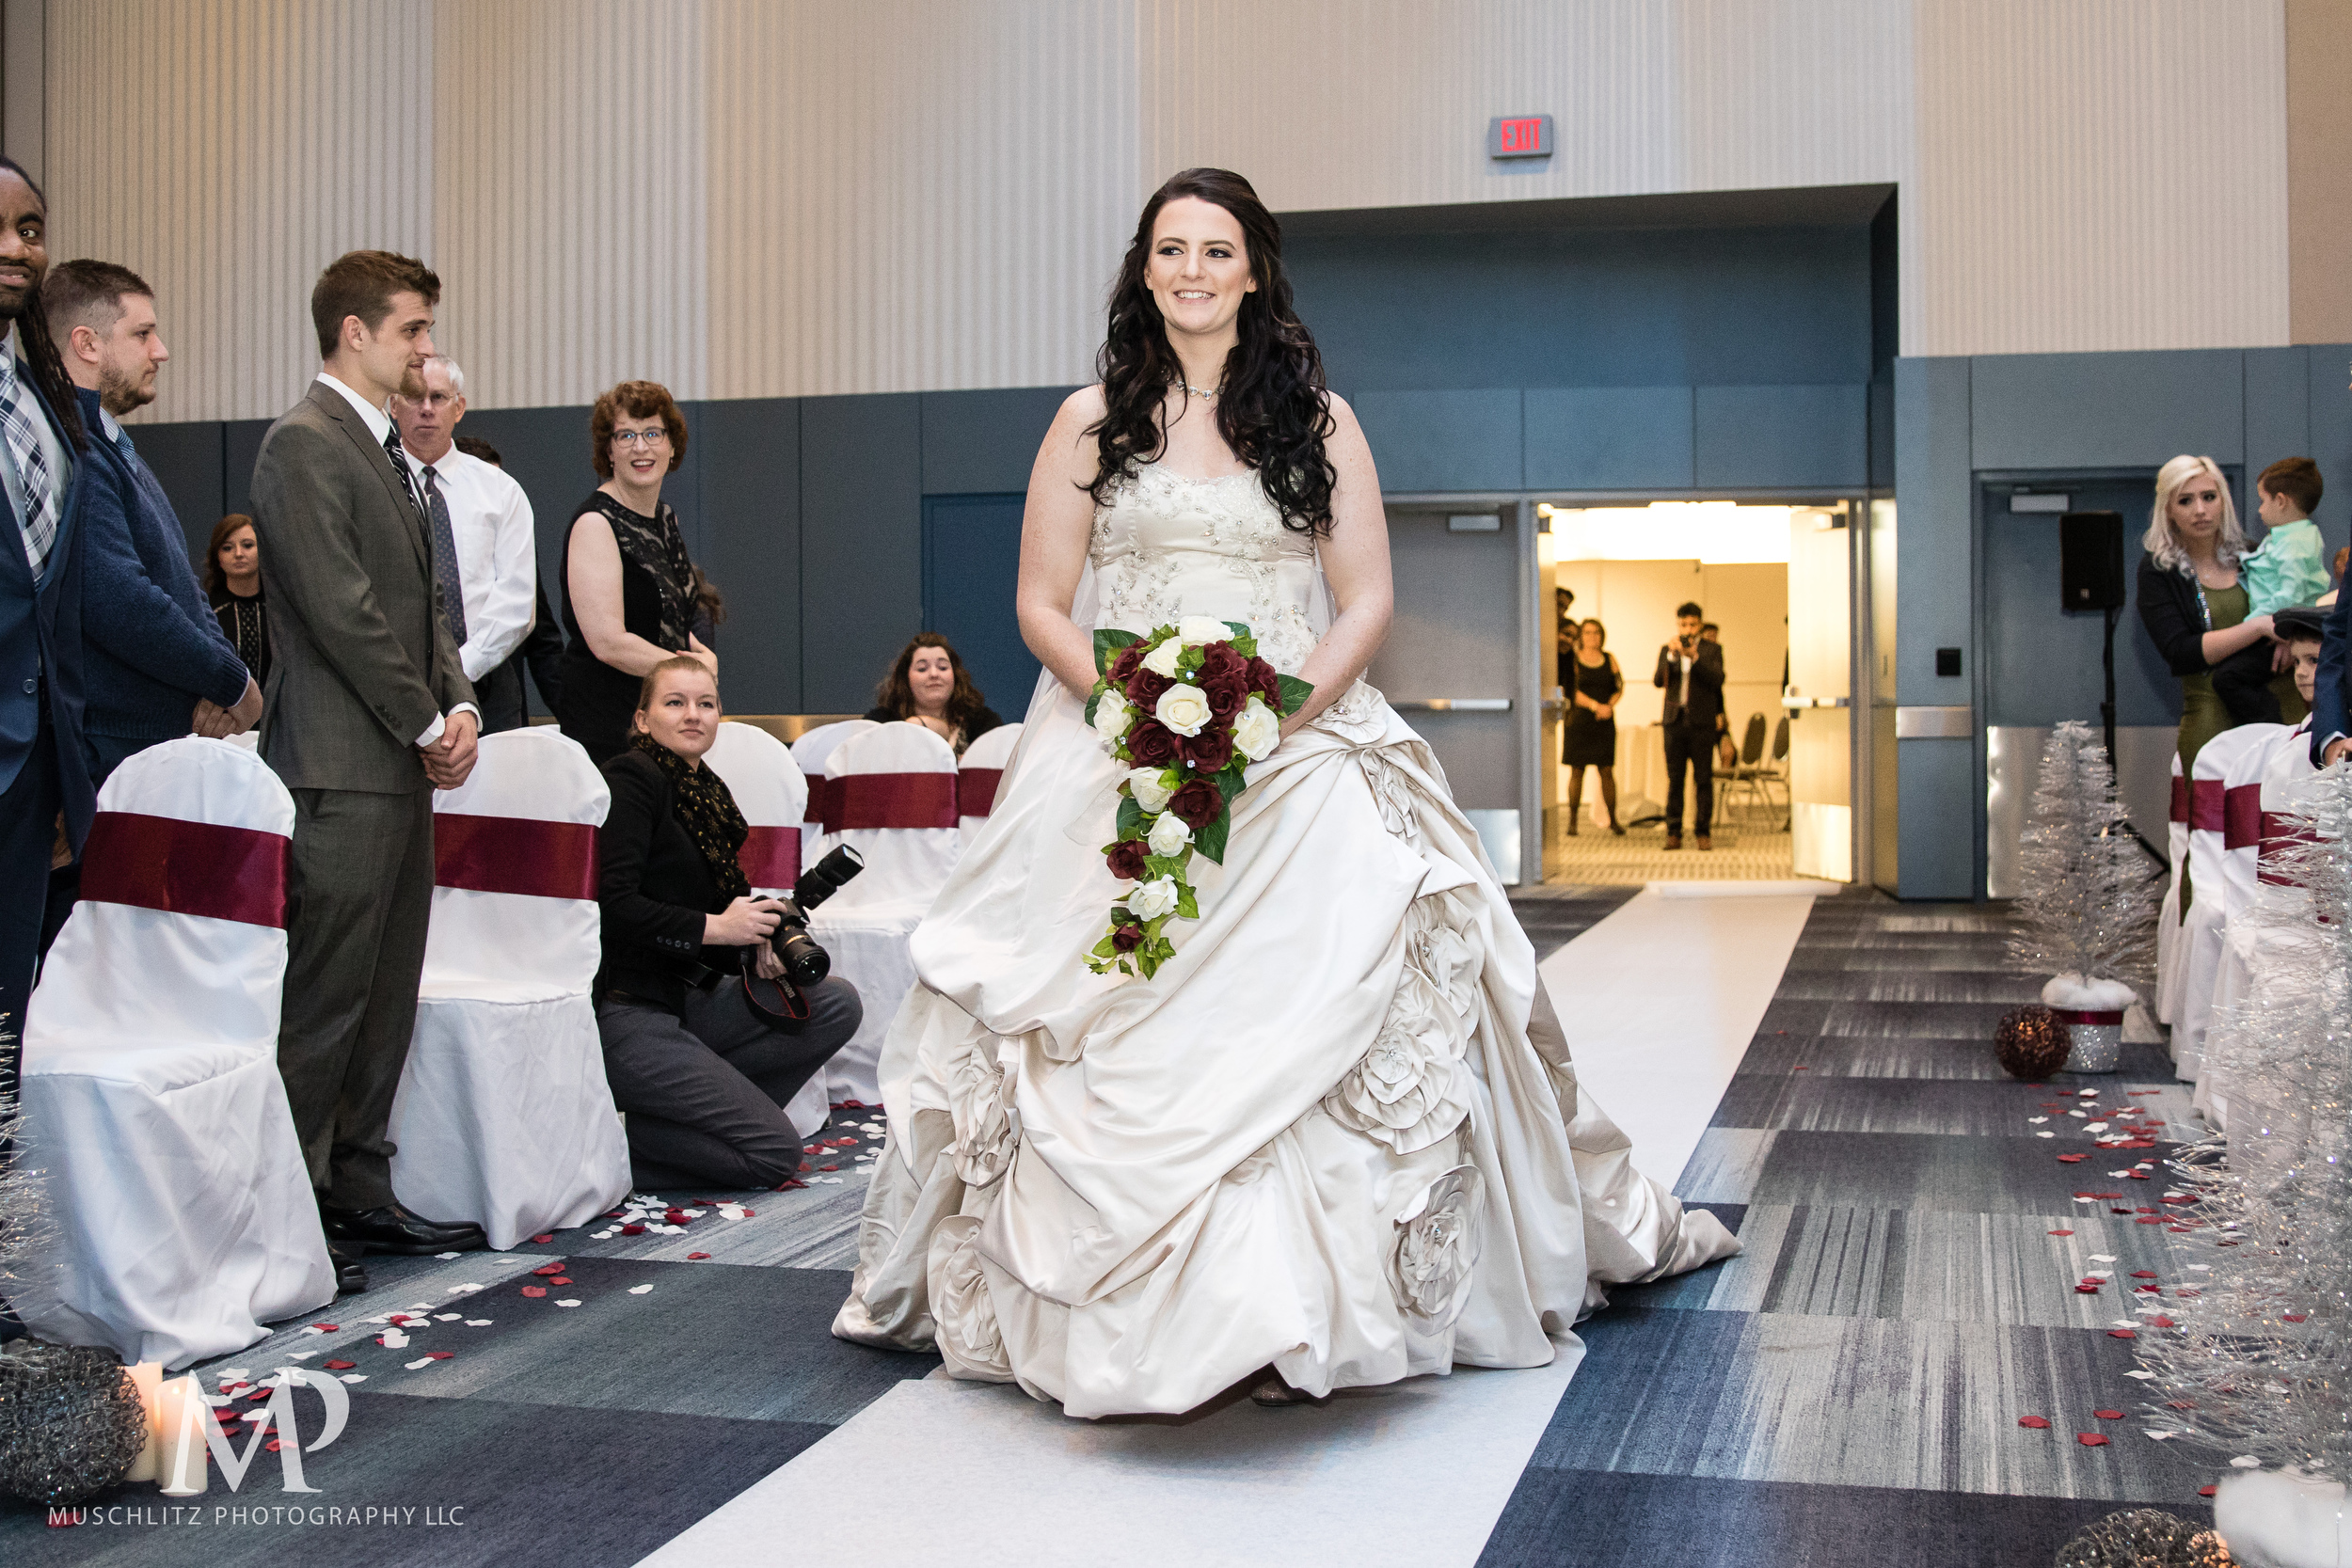 greater-columbus-convention-center-winter-wedding-ceremony-reception-portraits-columbus-ohio-muschlitz-photography-024.JPG